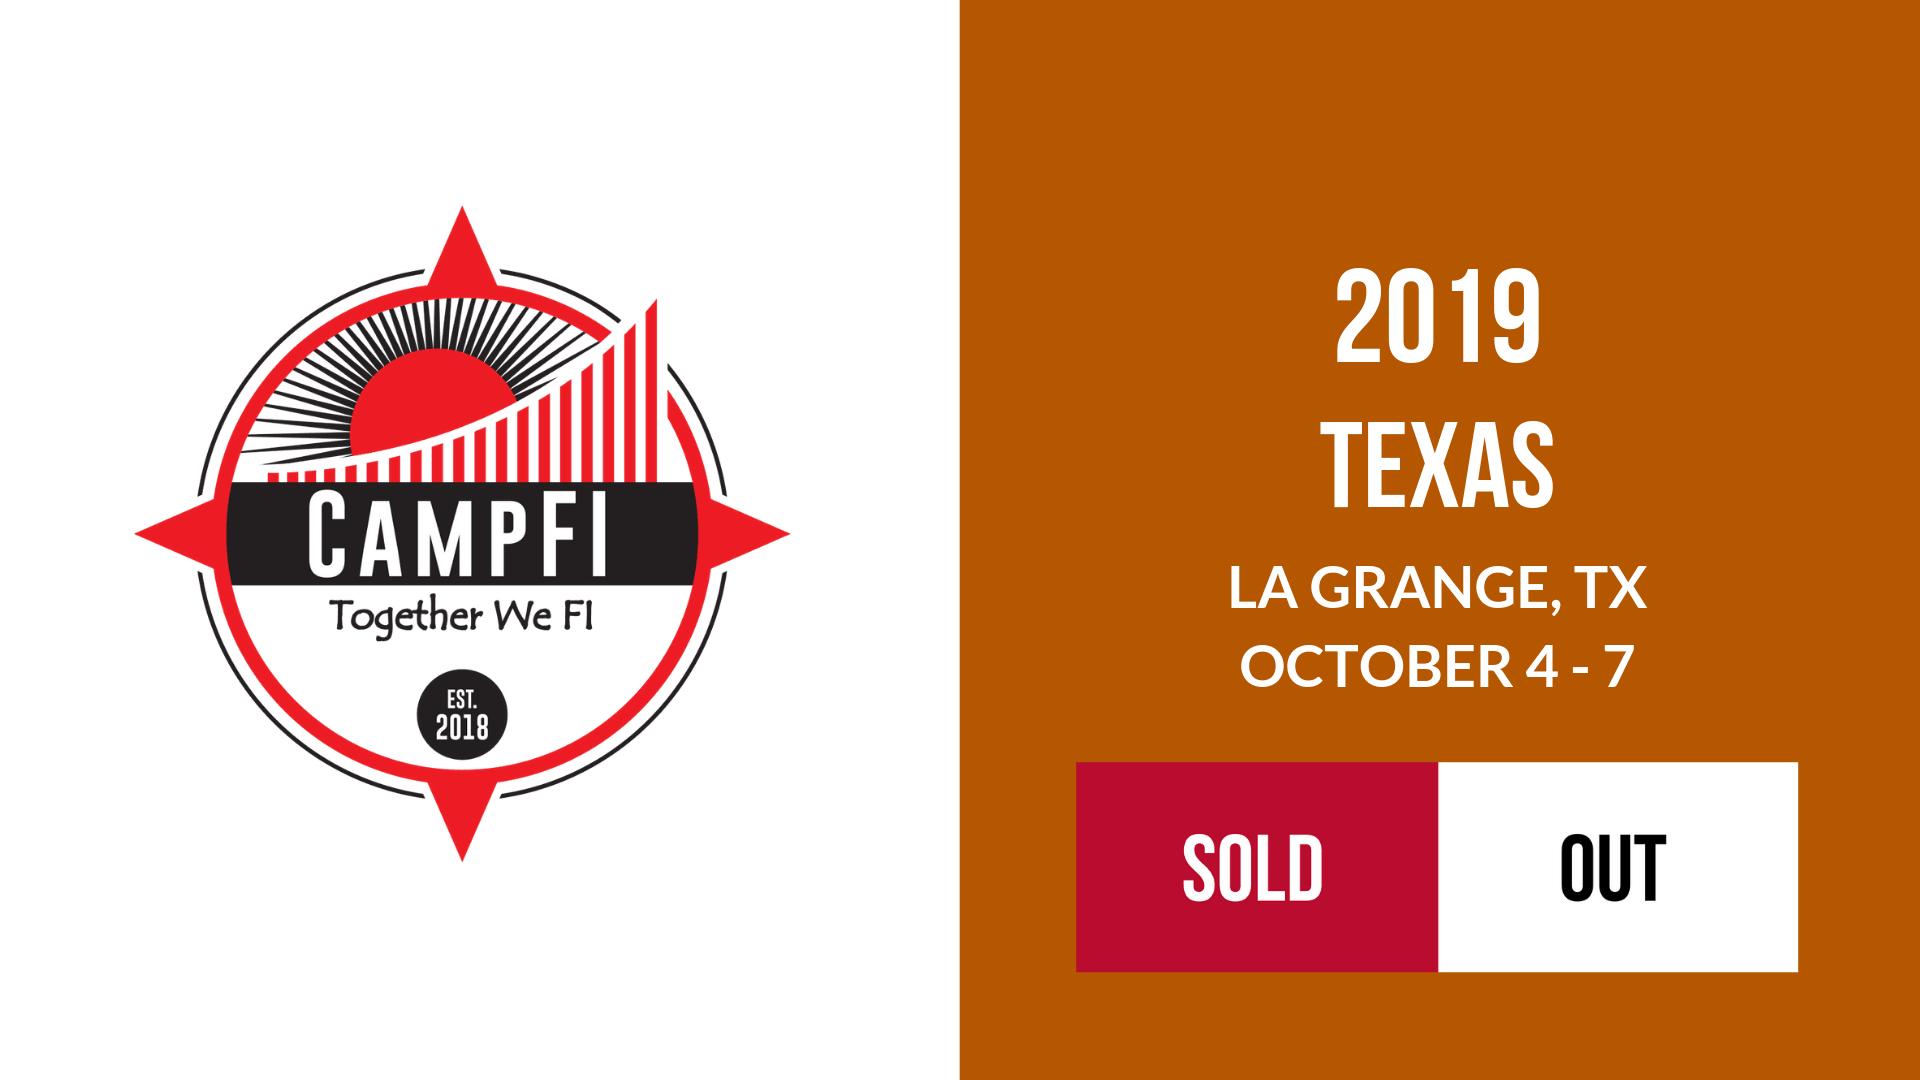 CampFI Texas 2019 Sold Out